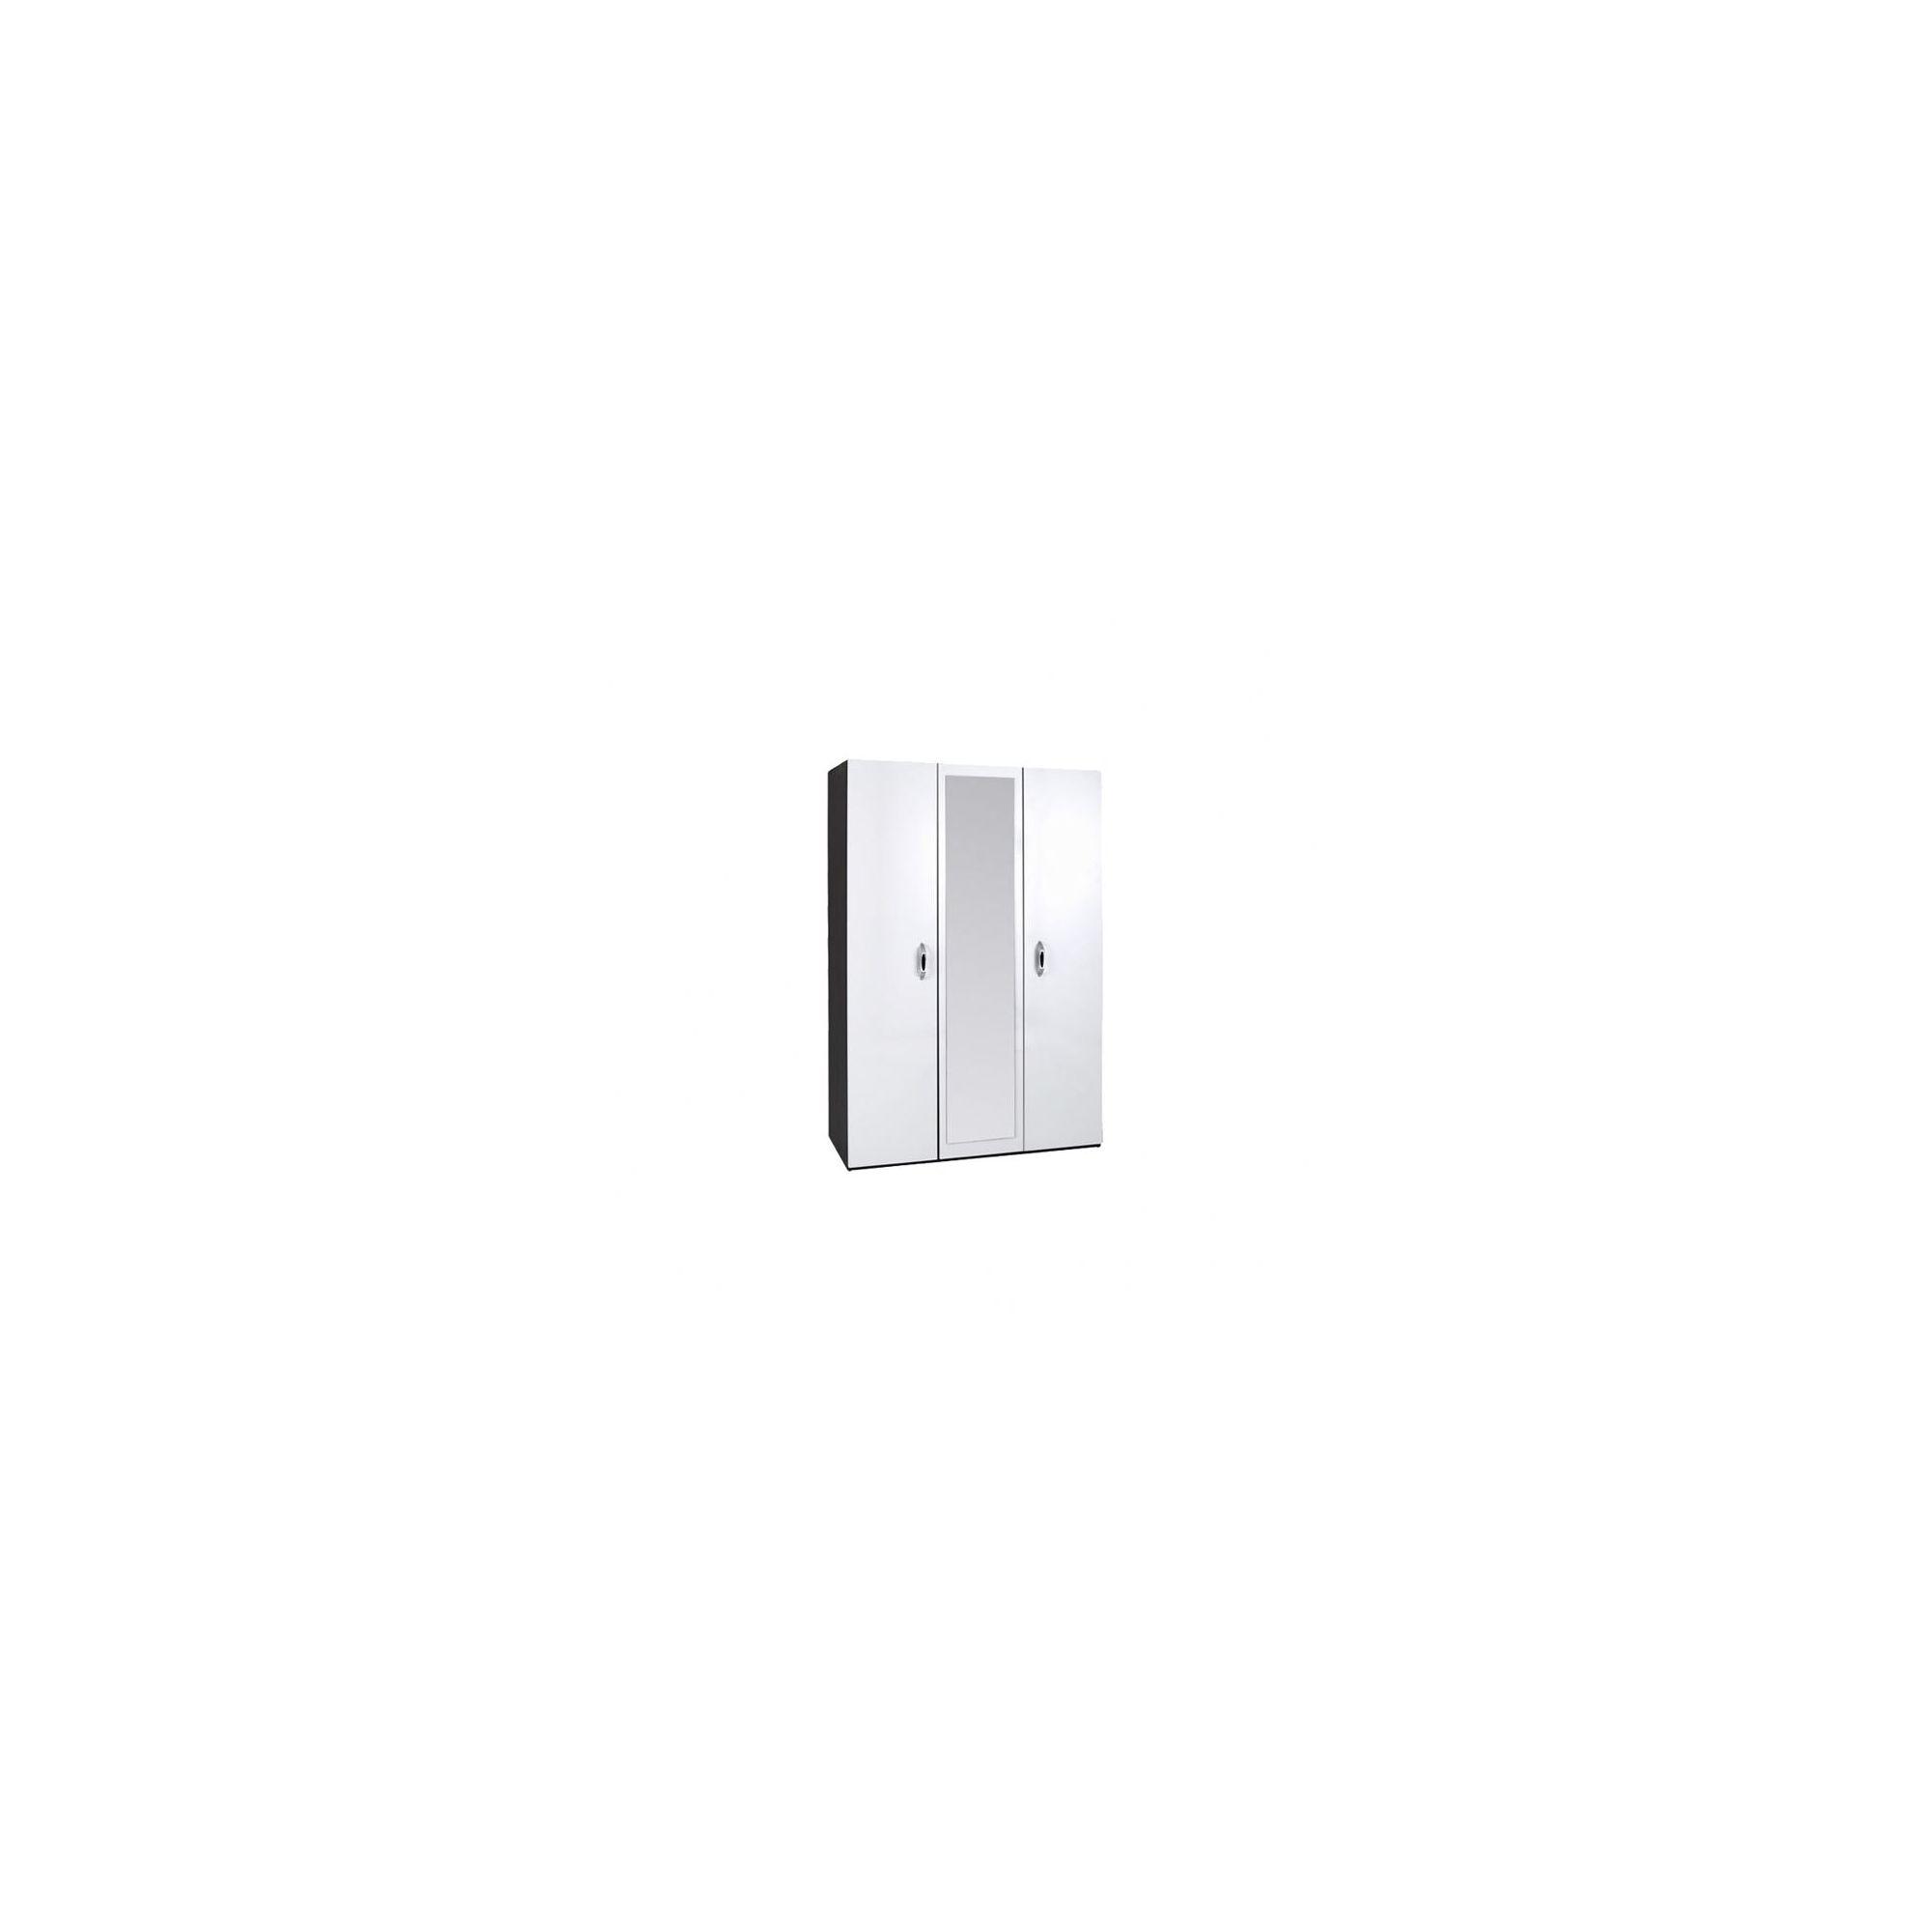 Alto Furniture Mode Piano Three Door Wardrobe in White at Tesco Direct